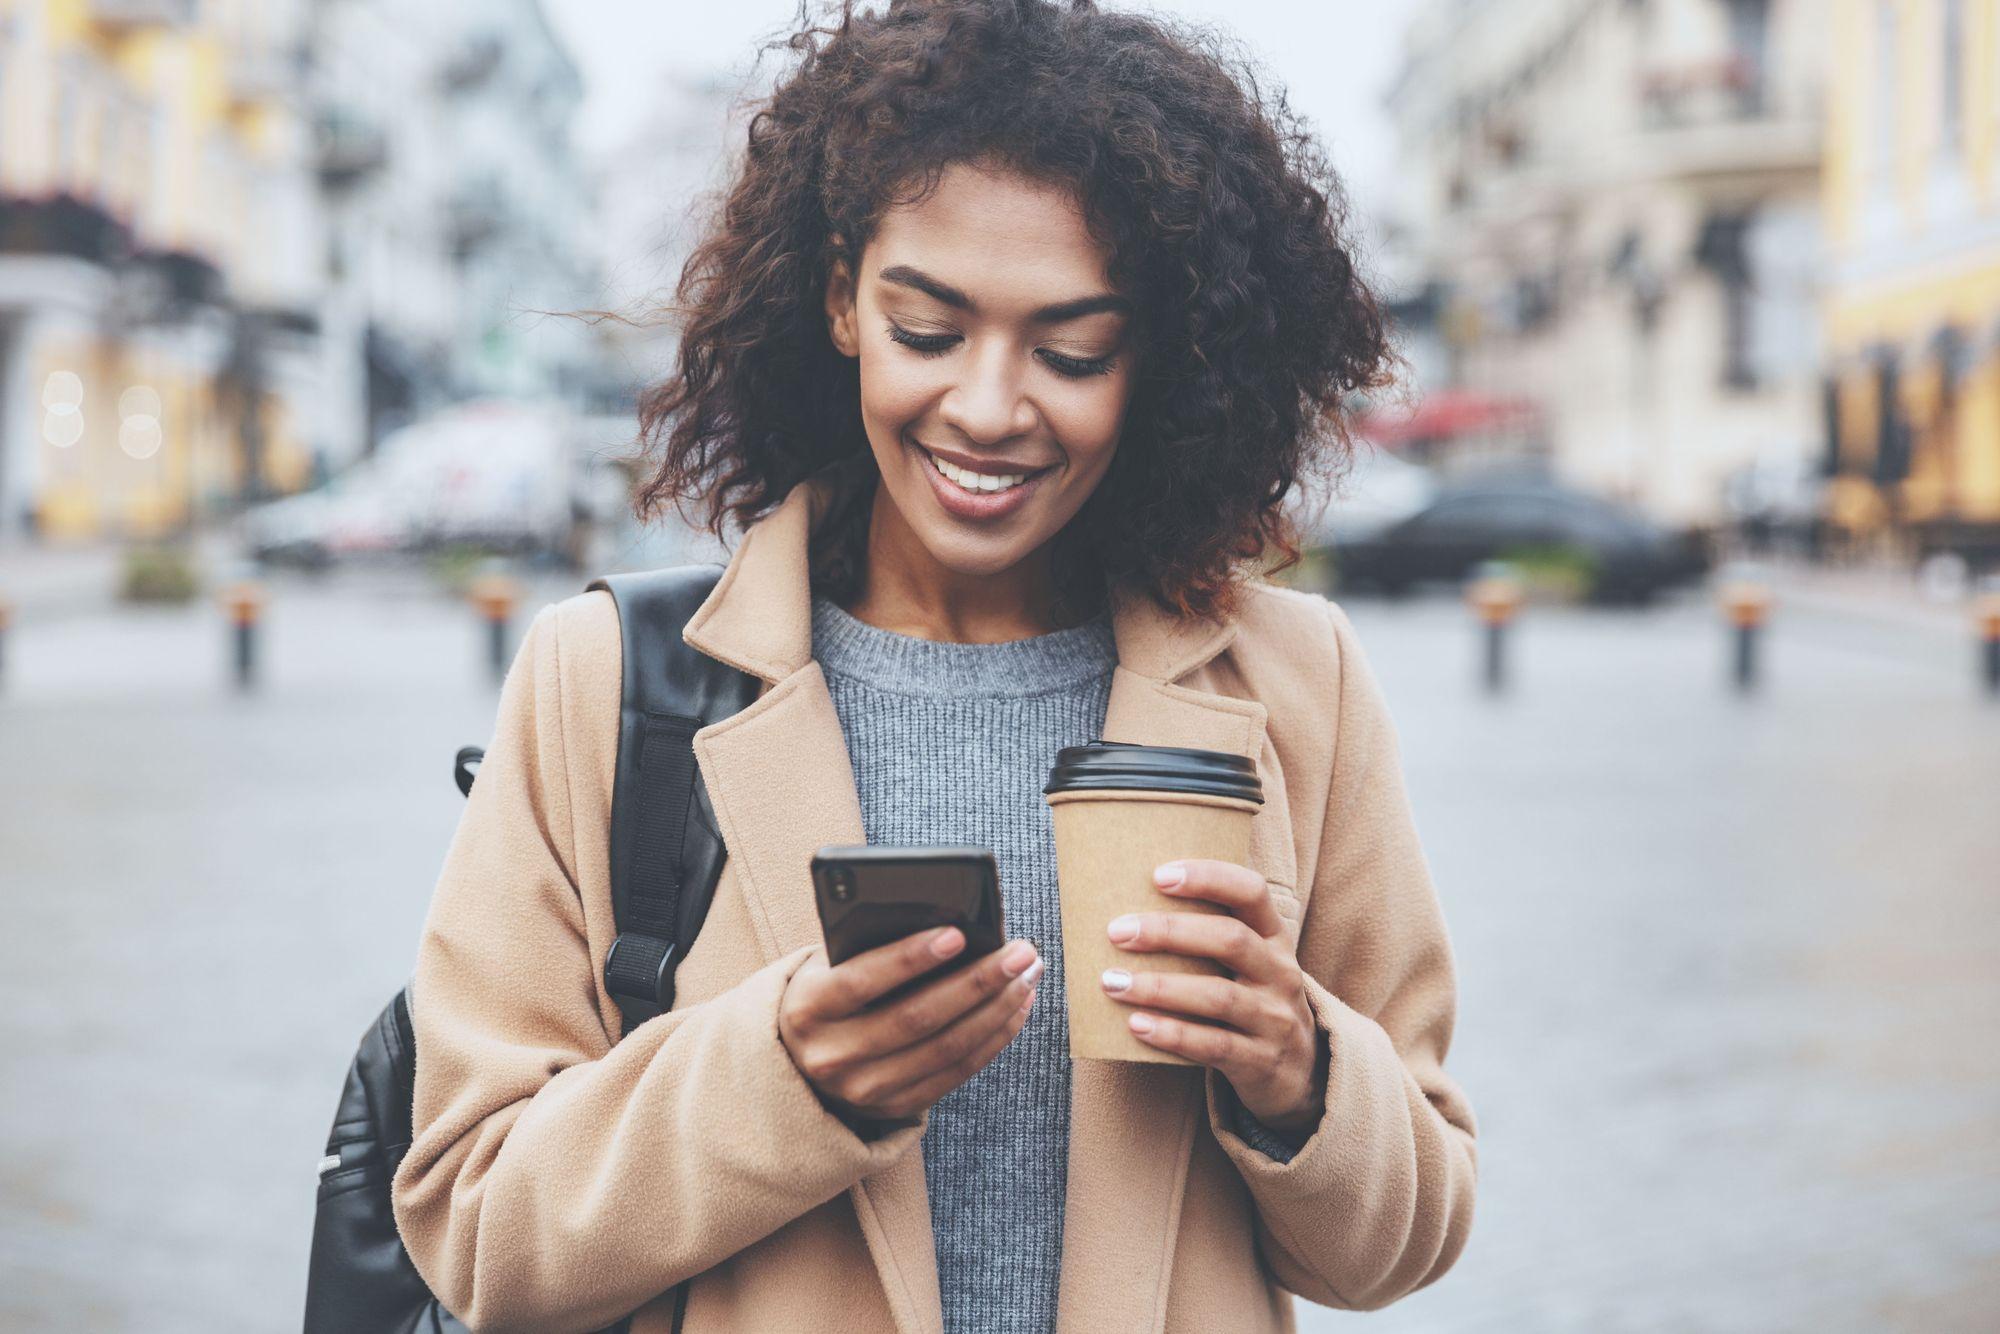 Lady smiling on phone